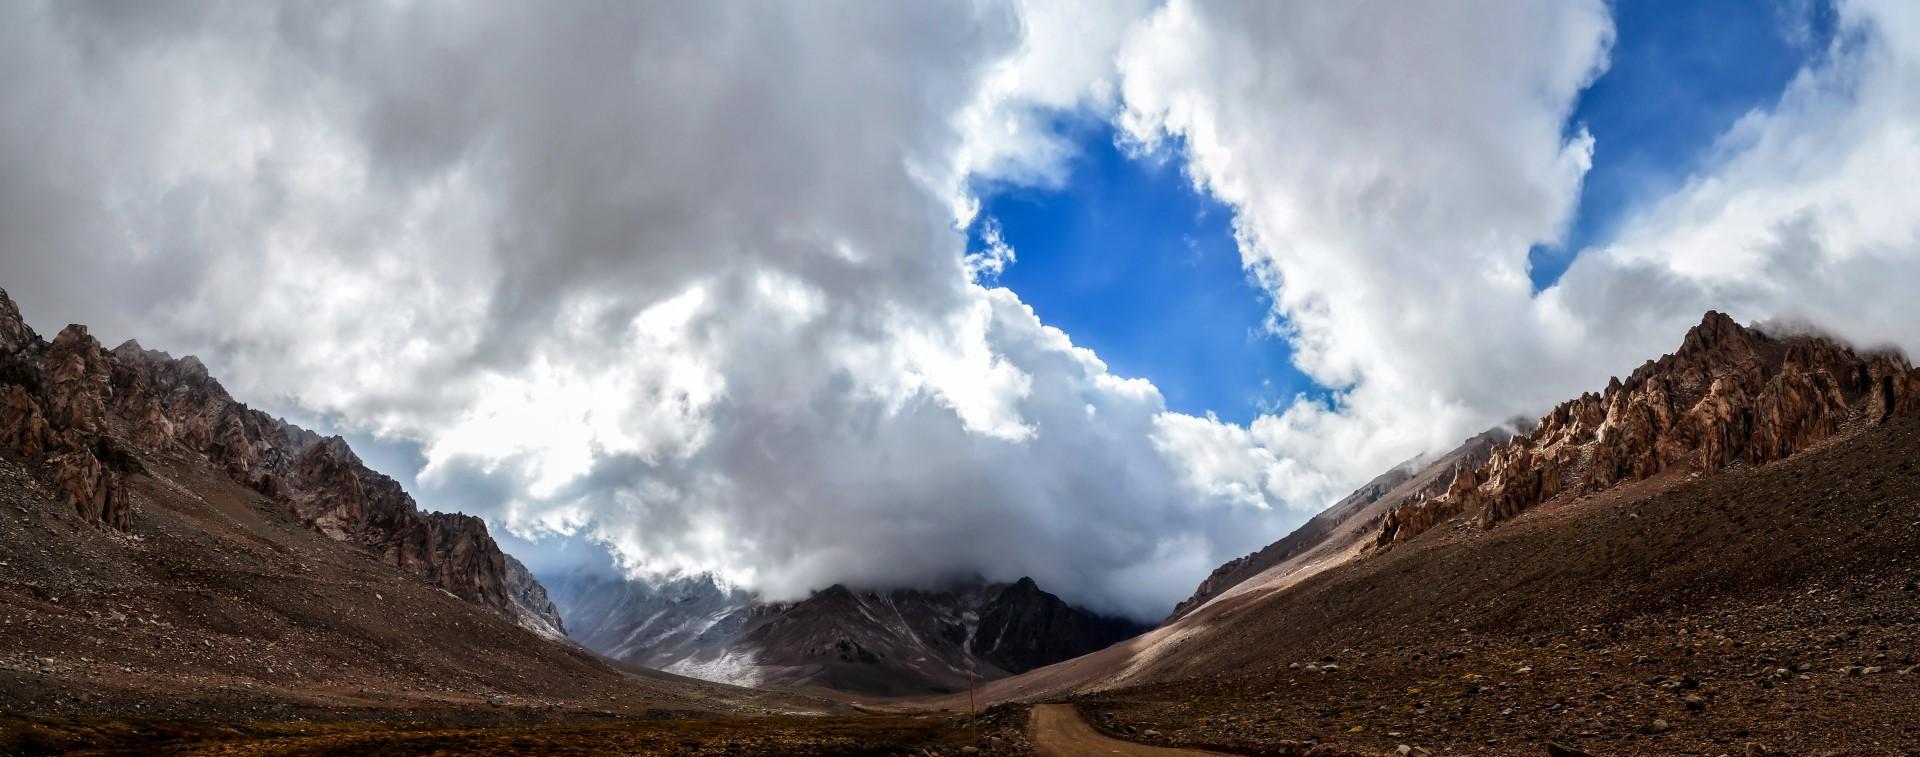 Clouds rolling in at Los Helados